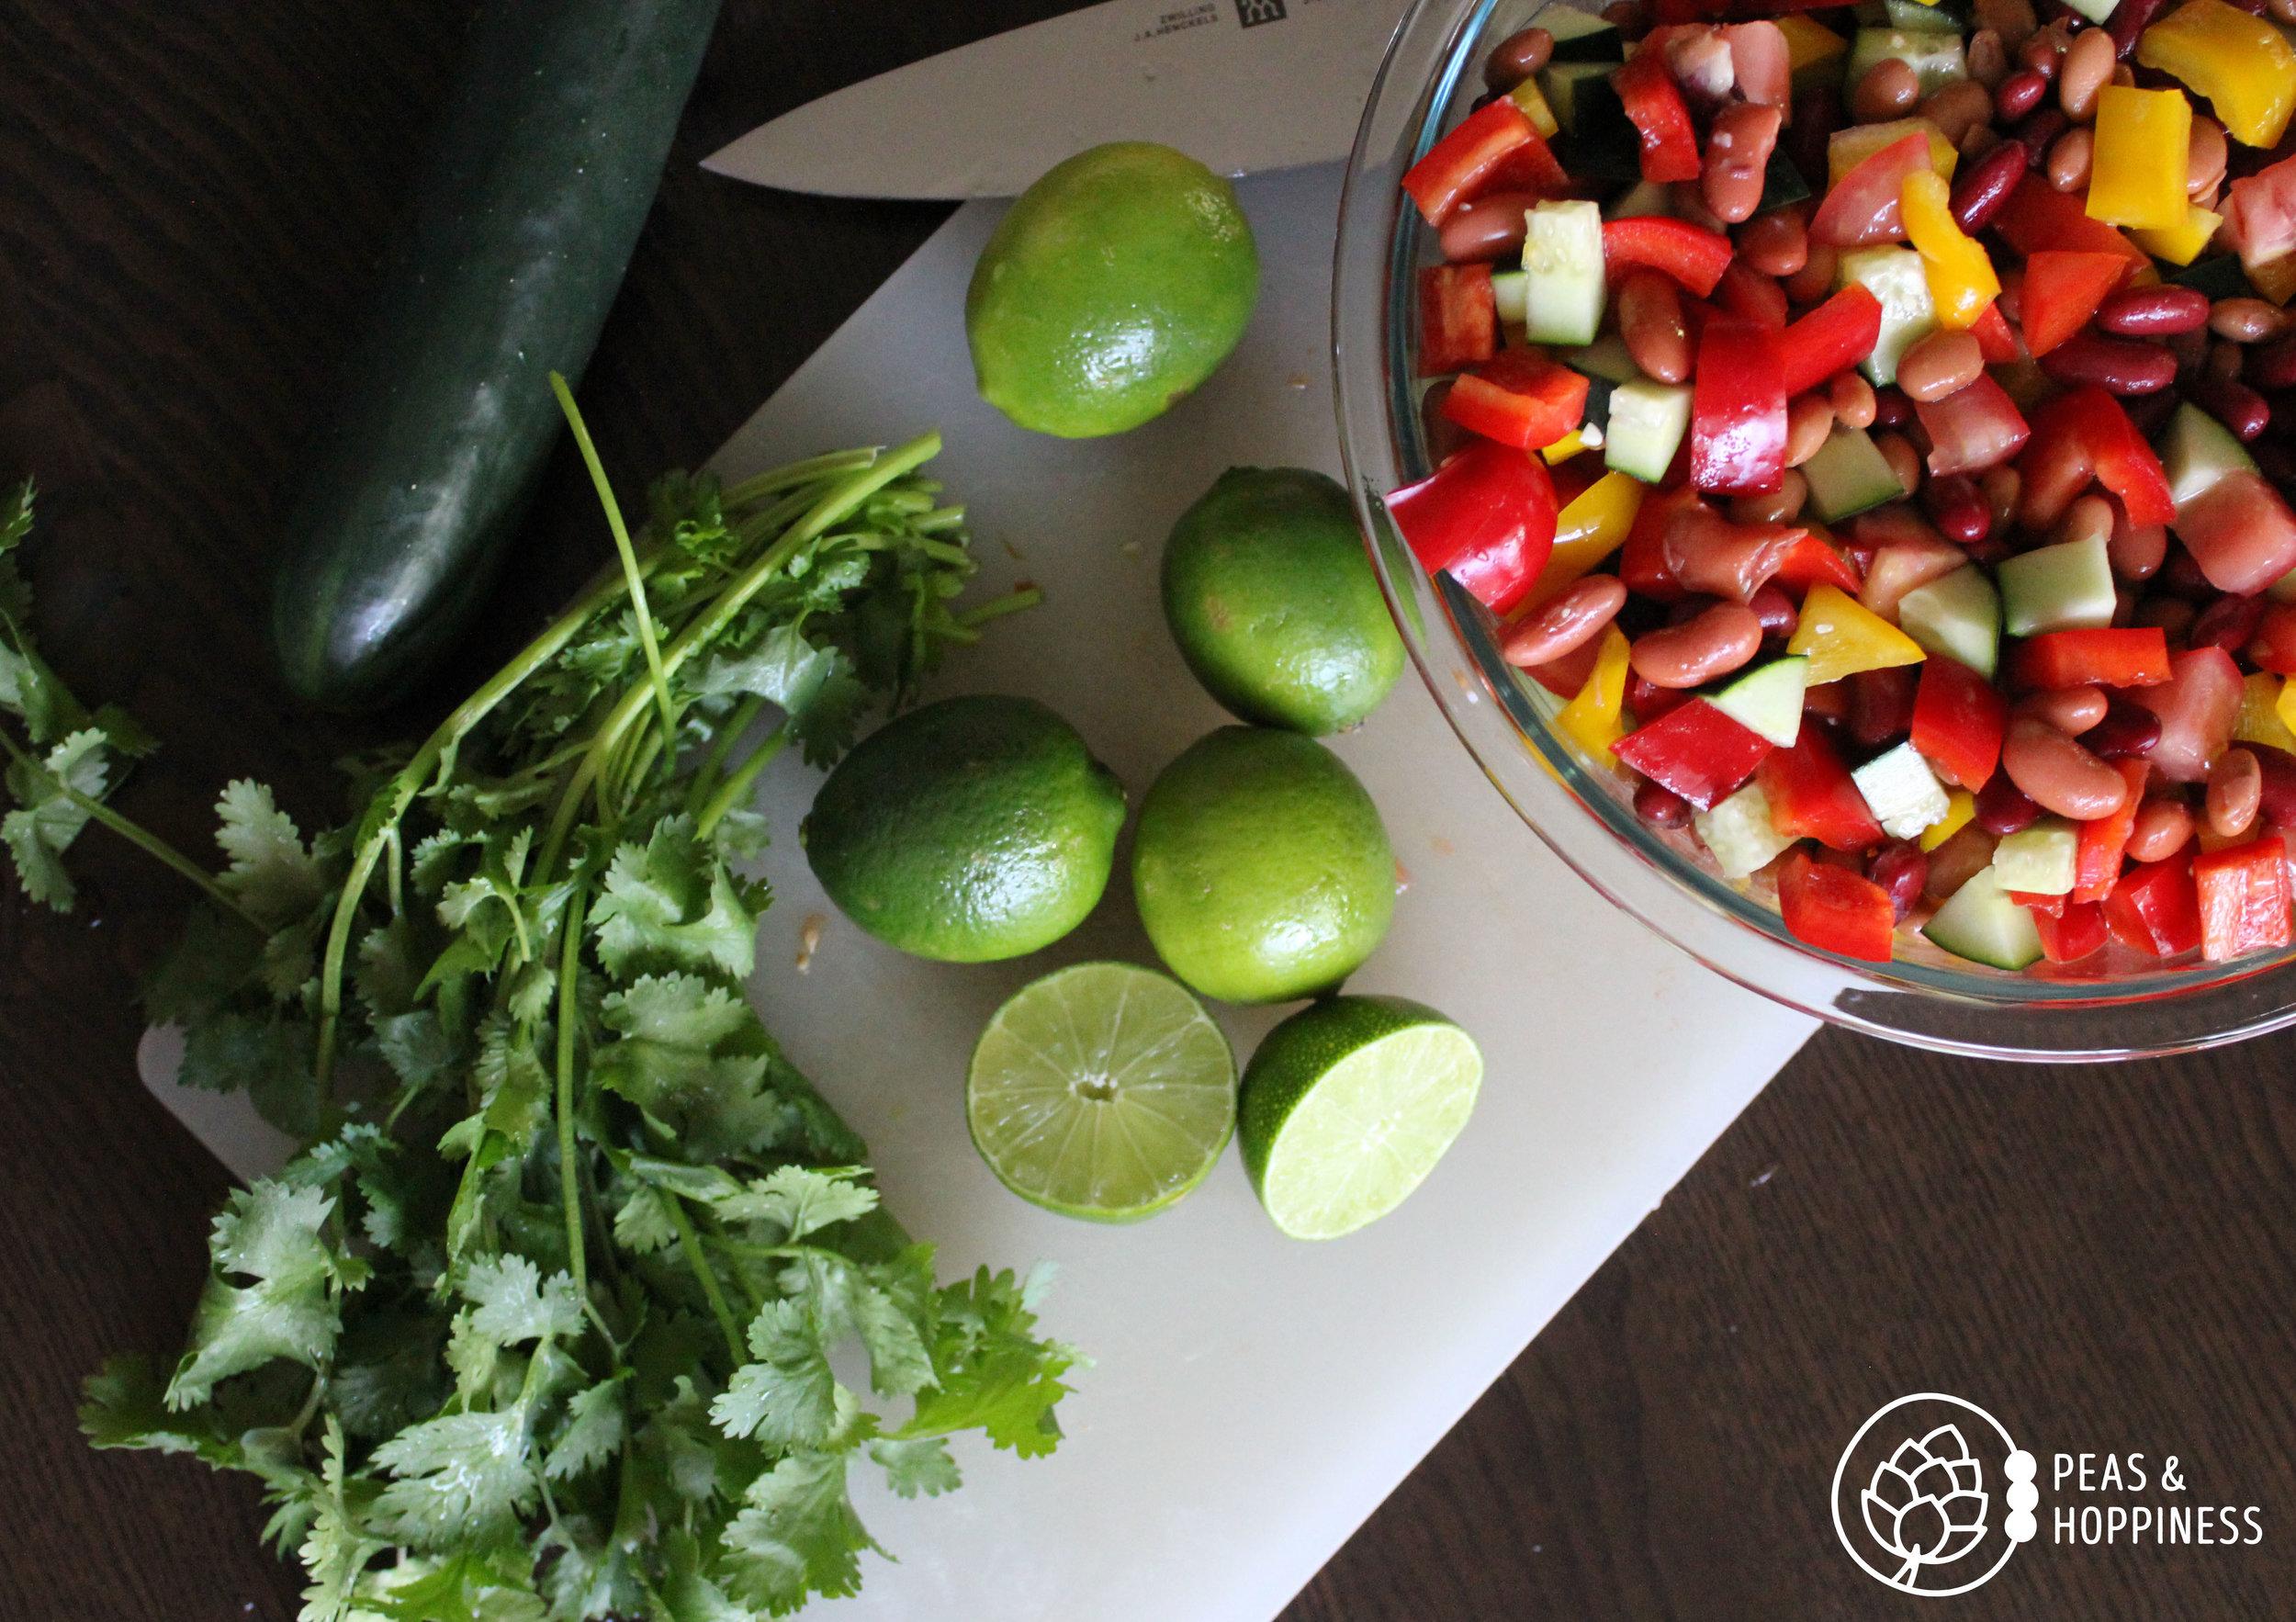 Quality ingredients, quality food.